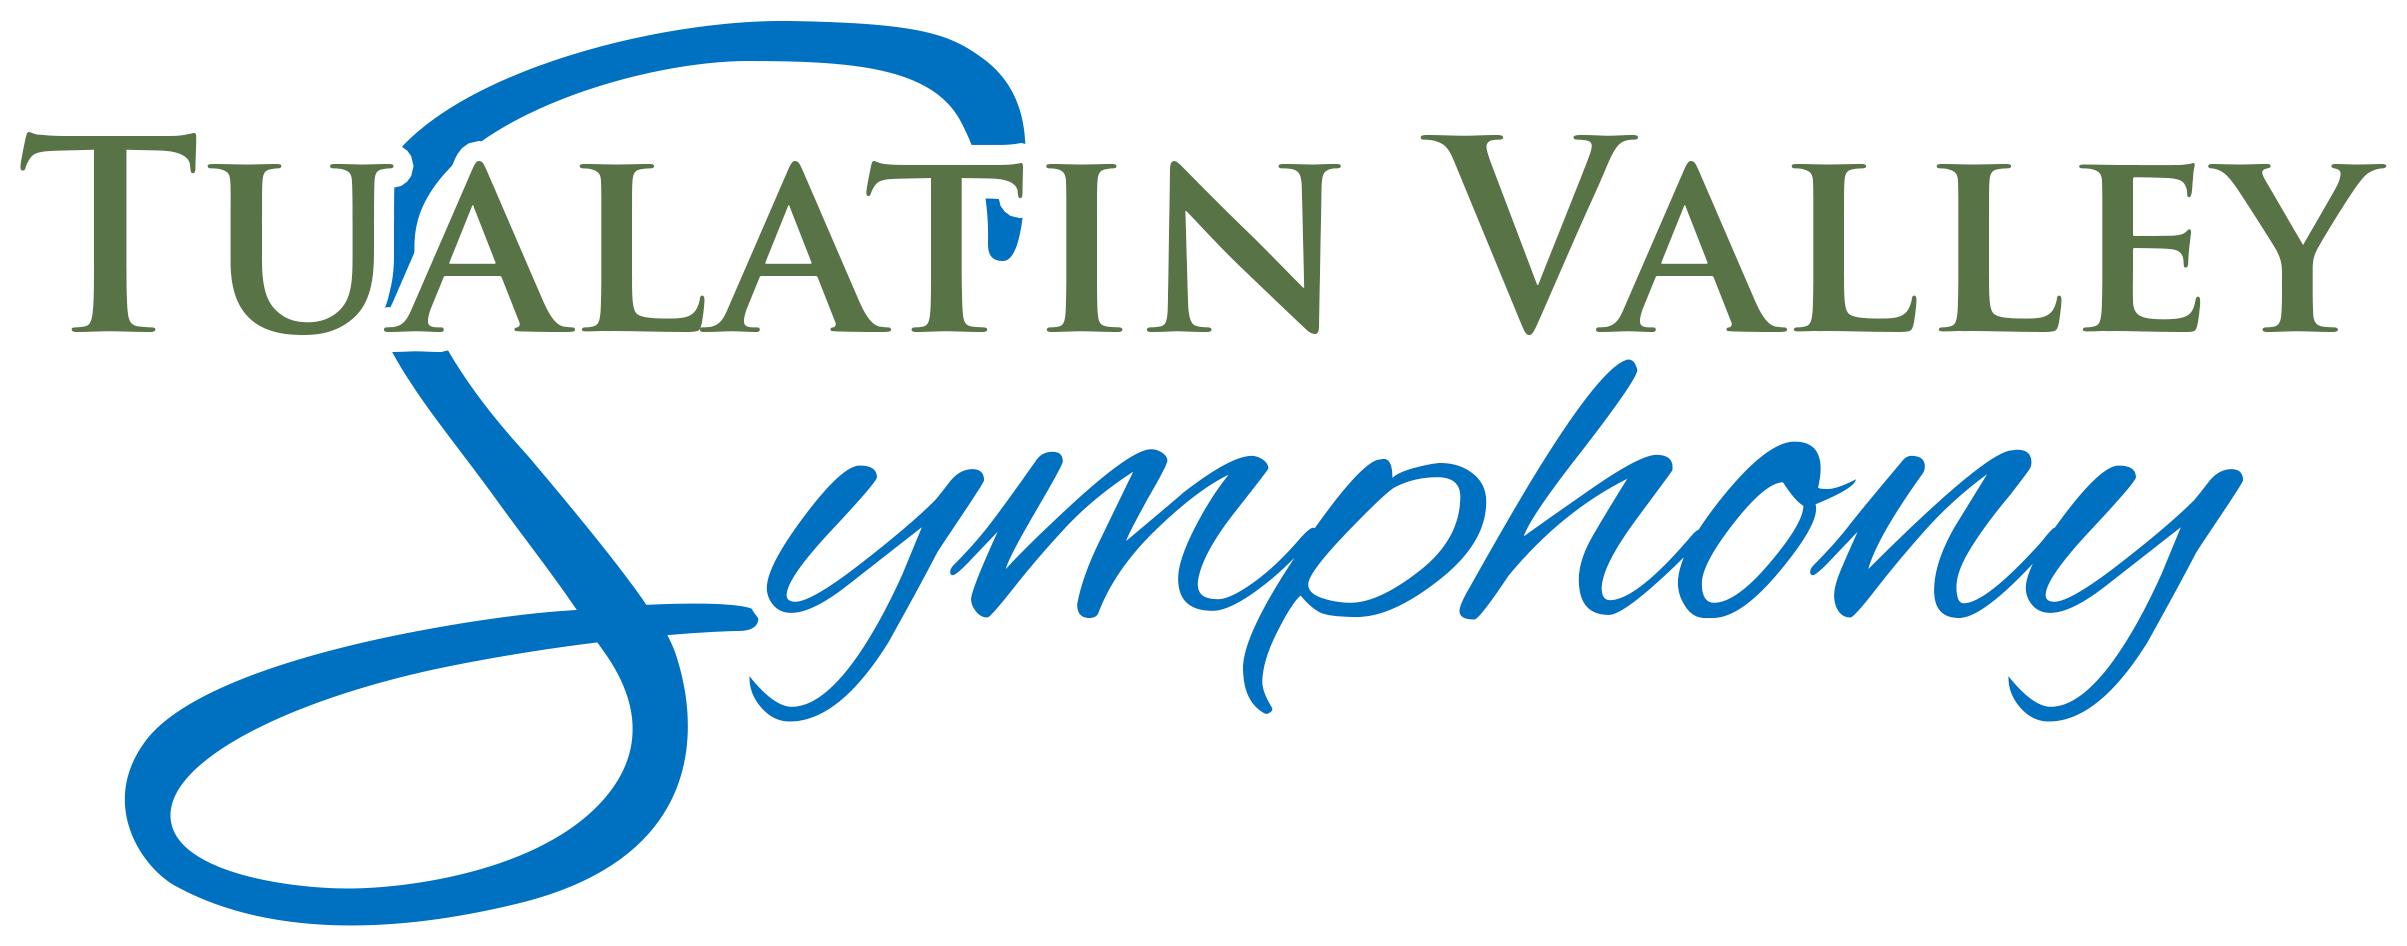 Tualatin Valley Symphony